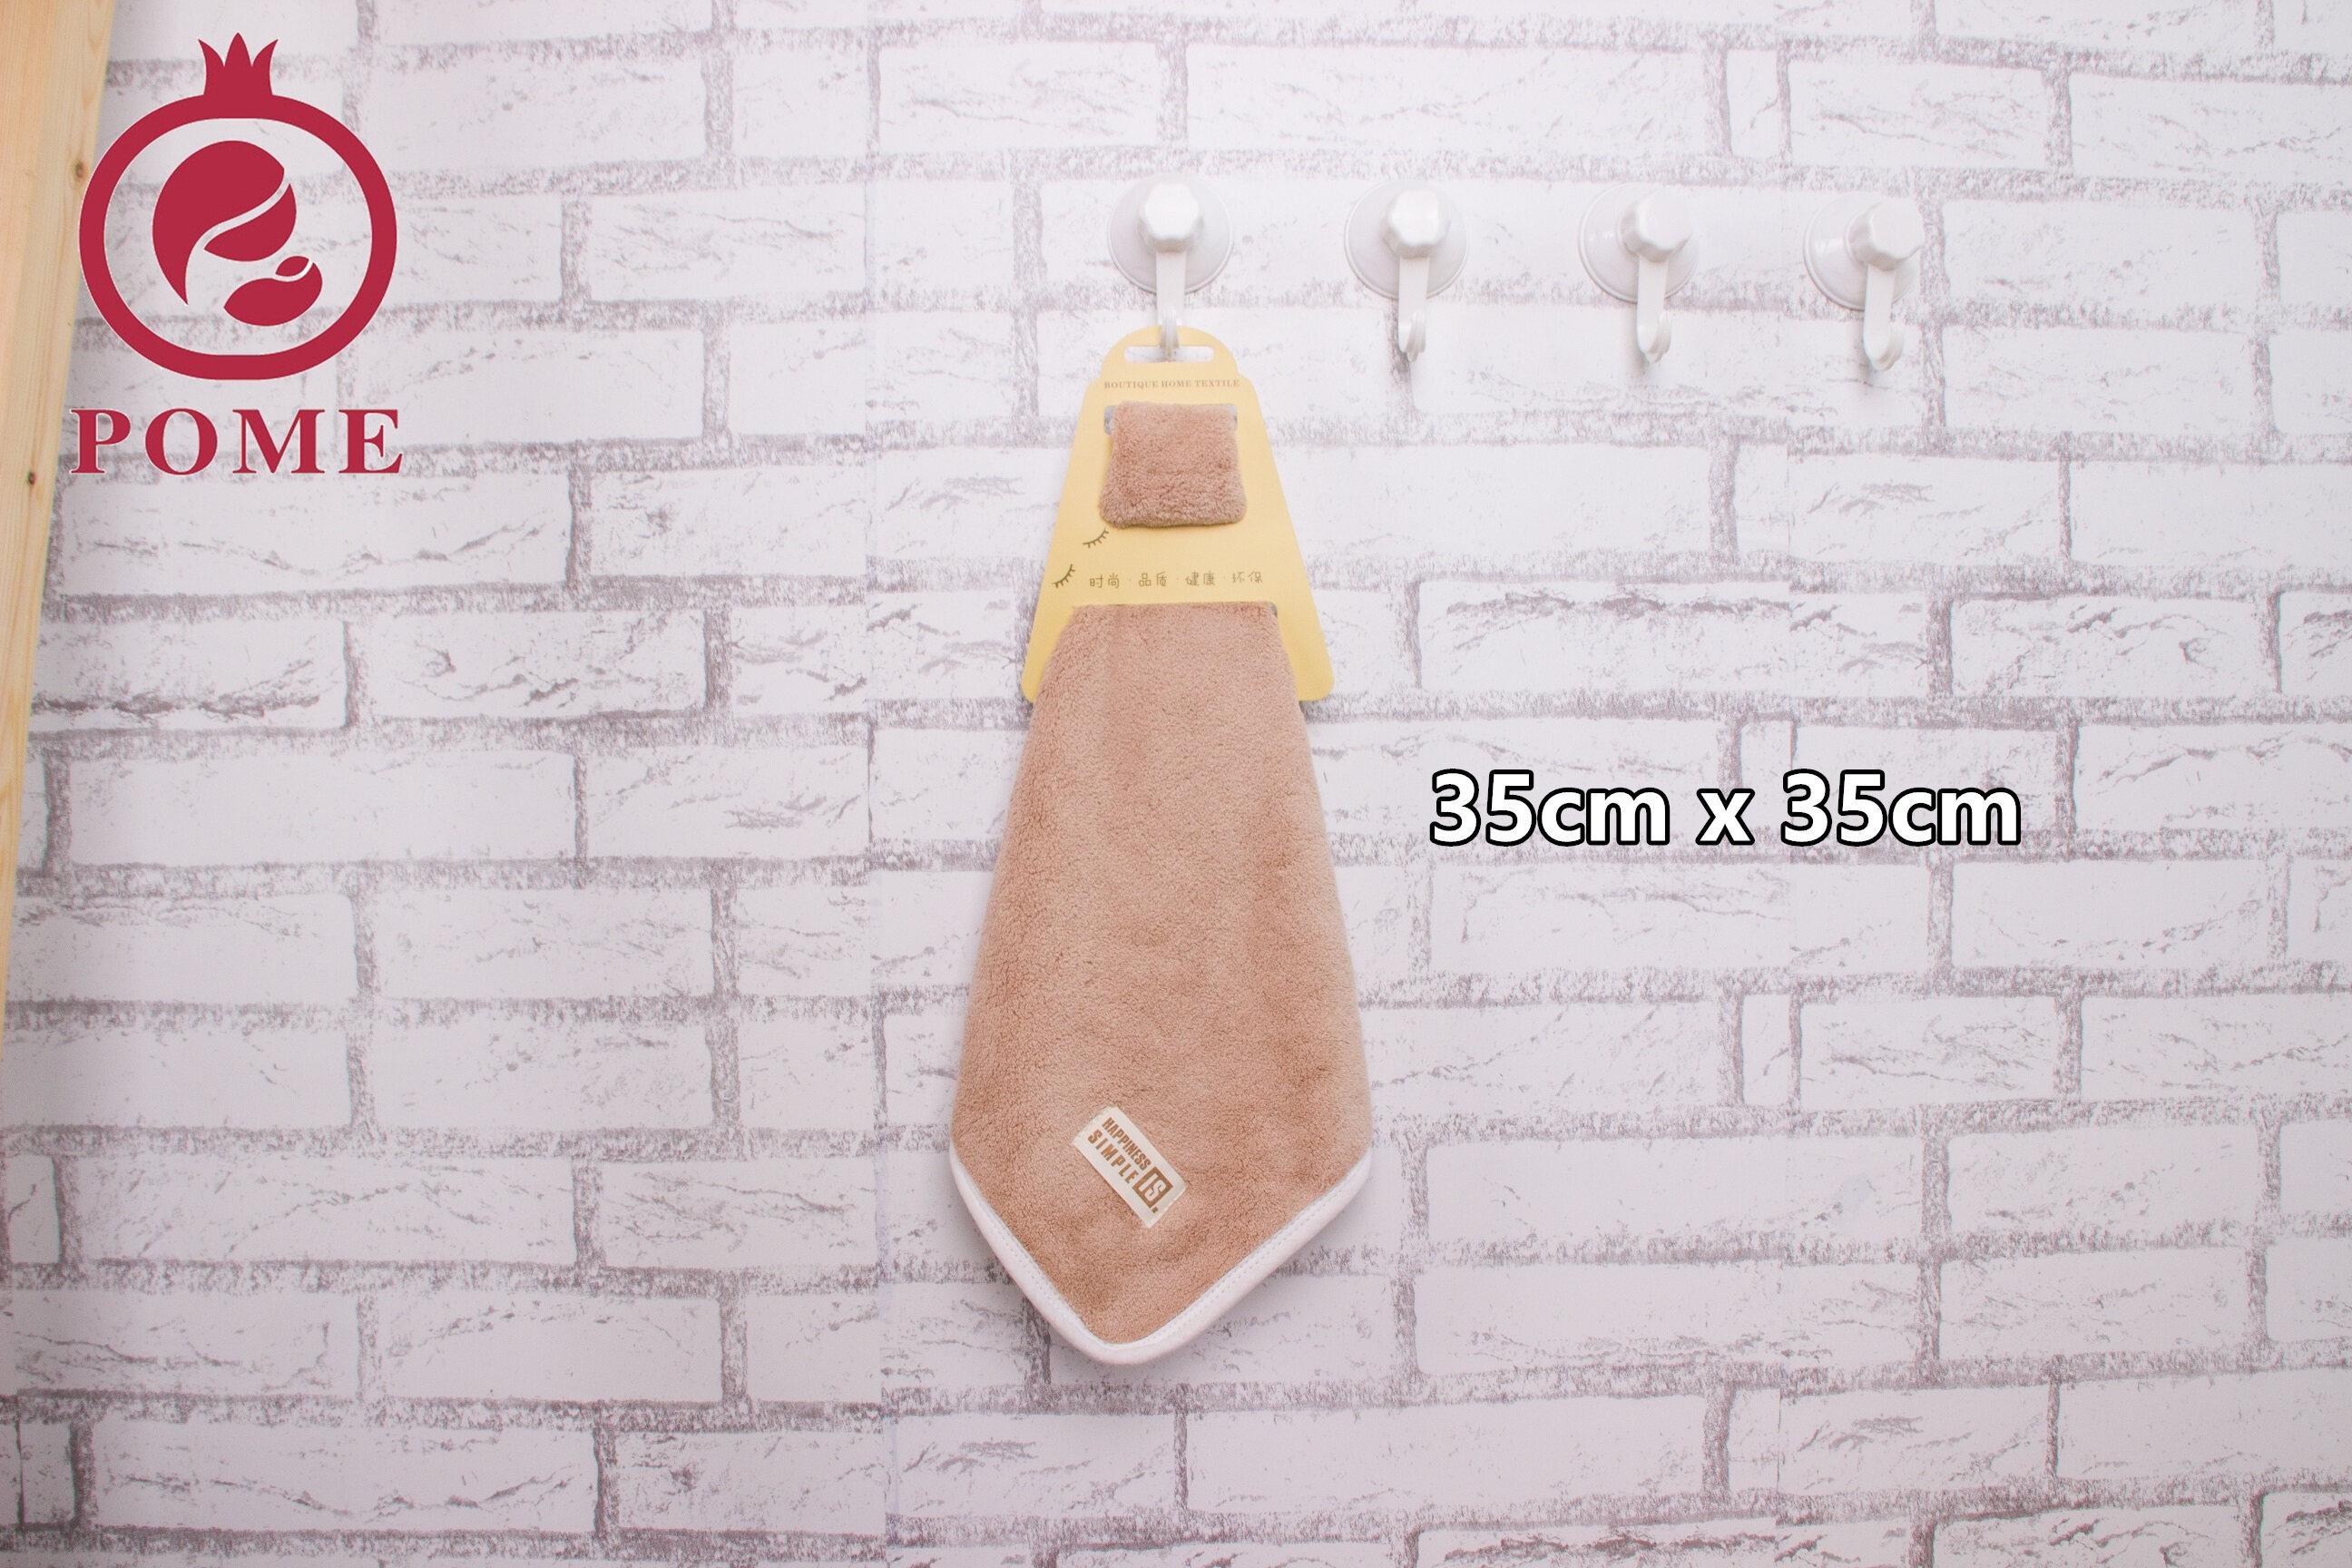 Pome Baby Handkerchief Hanging Towel Cash Wash Towel Microfiber Ultra Soft High Absorbent